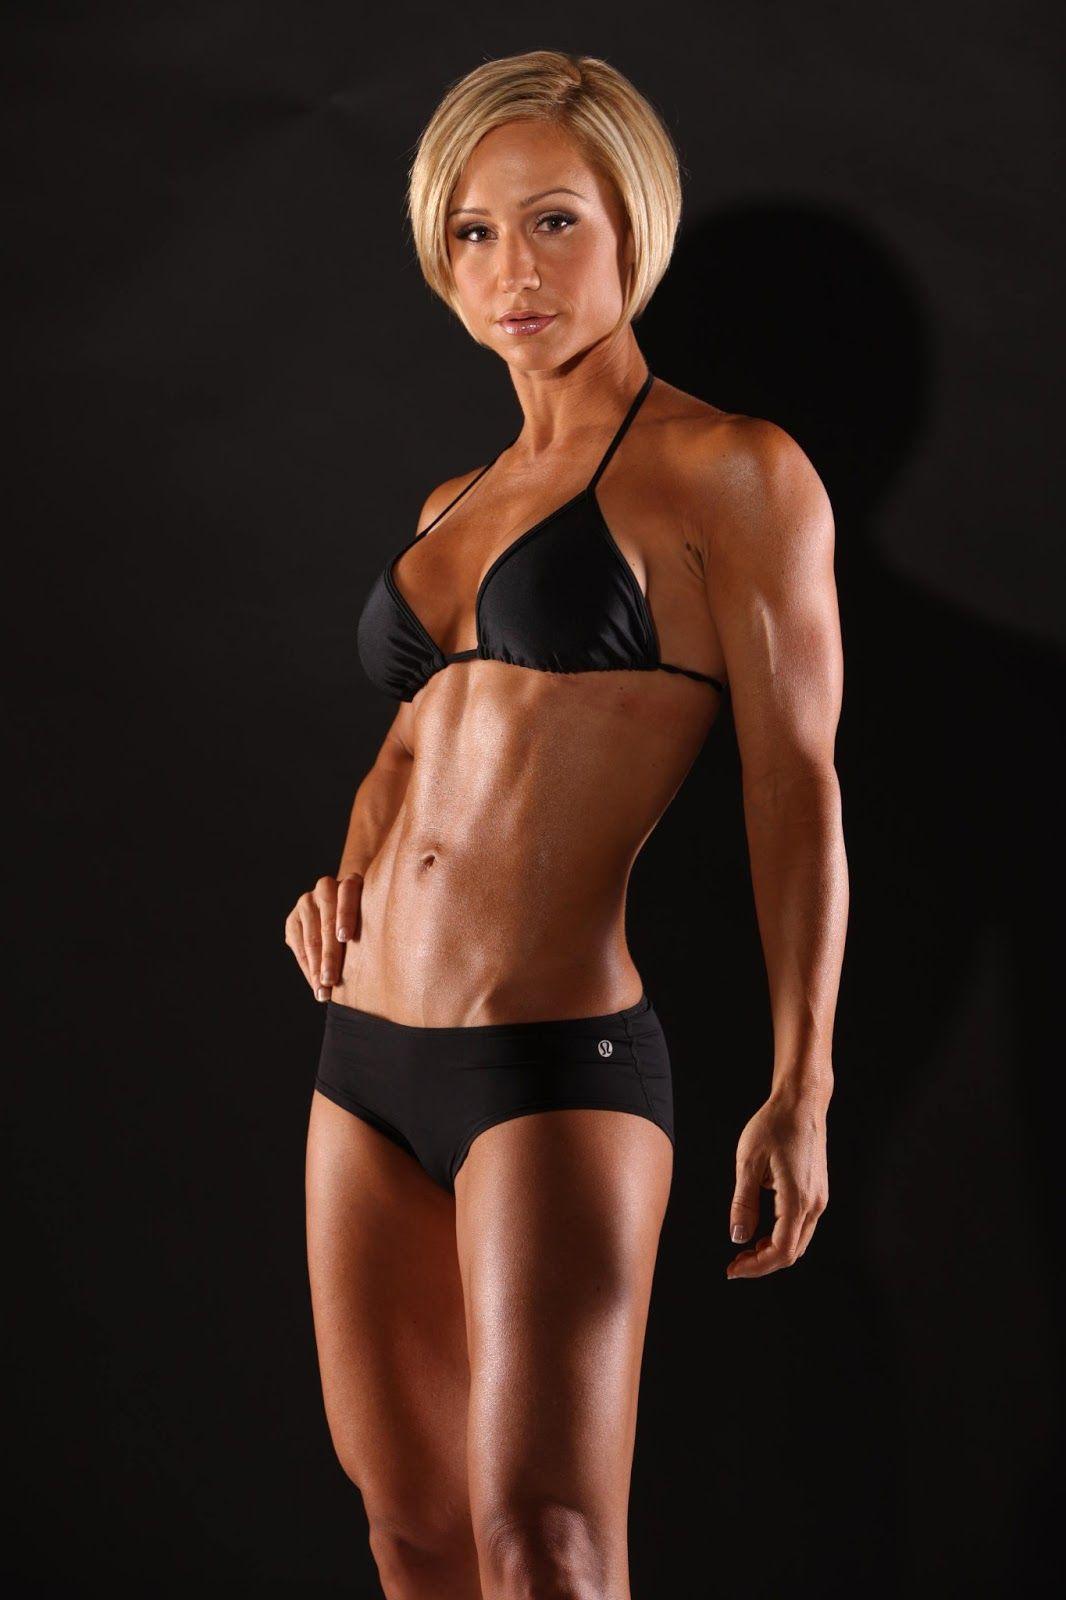 nude fitness model woman